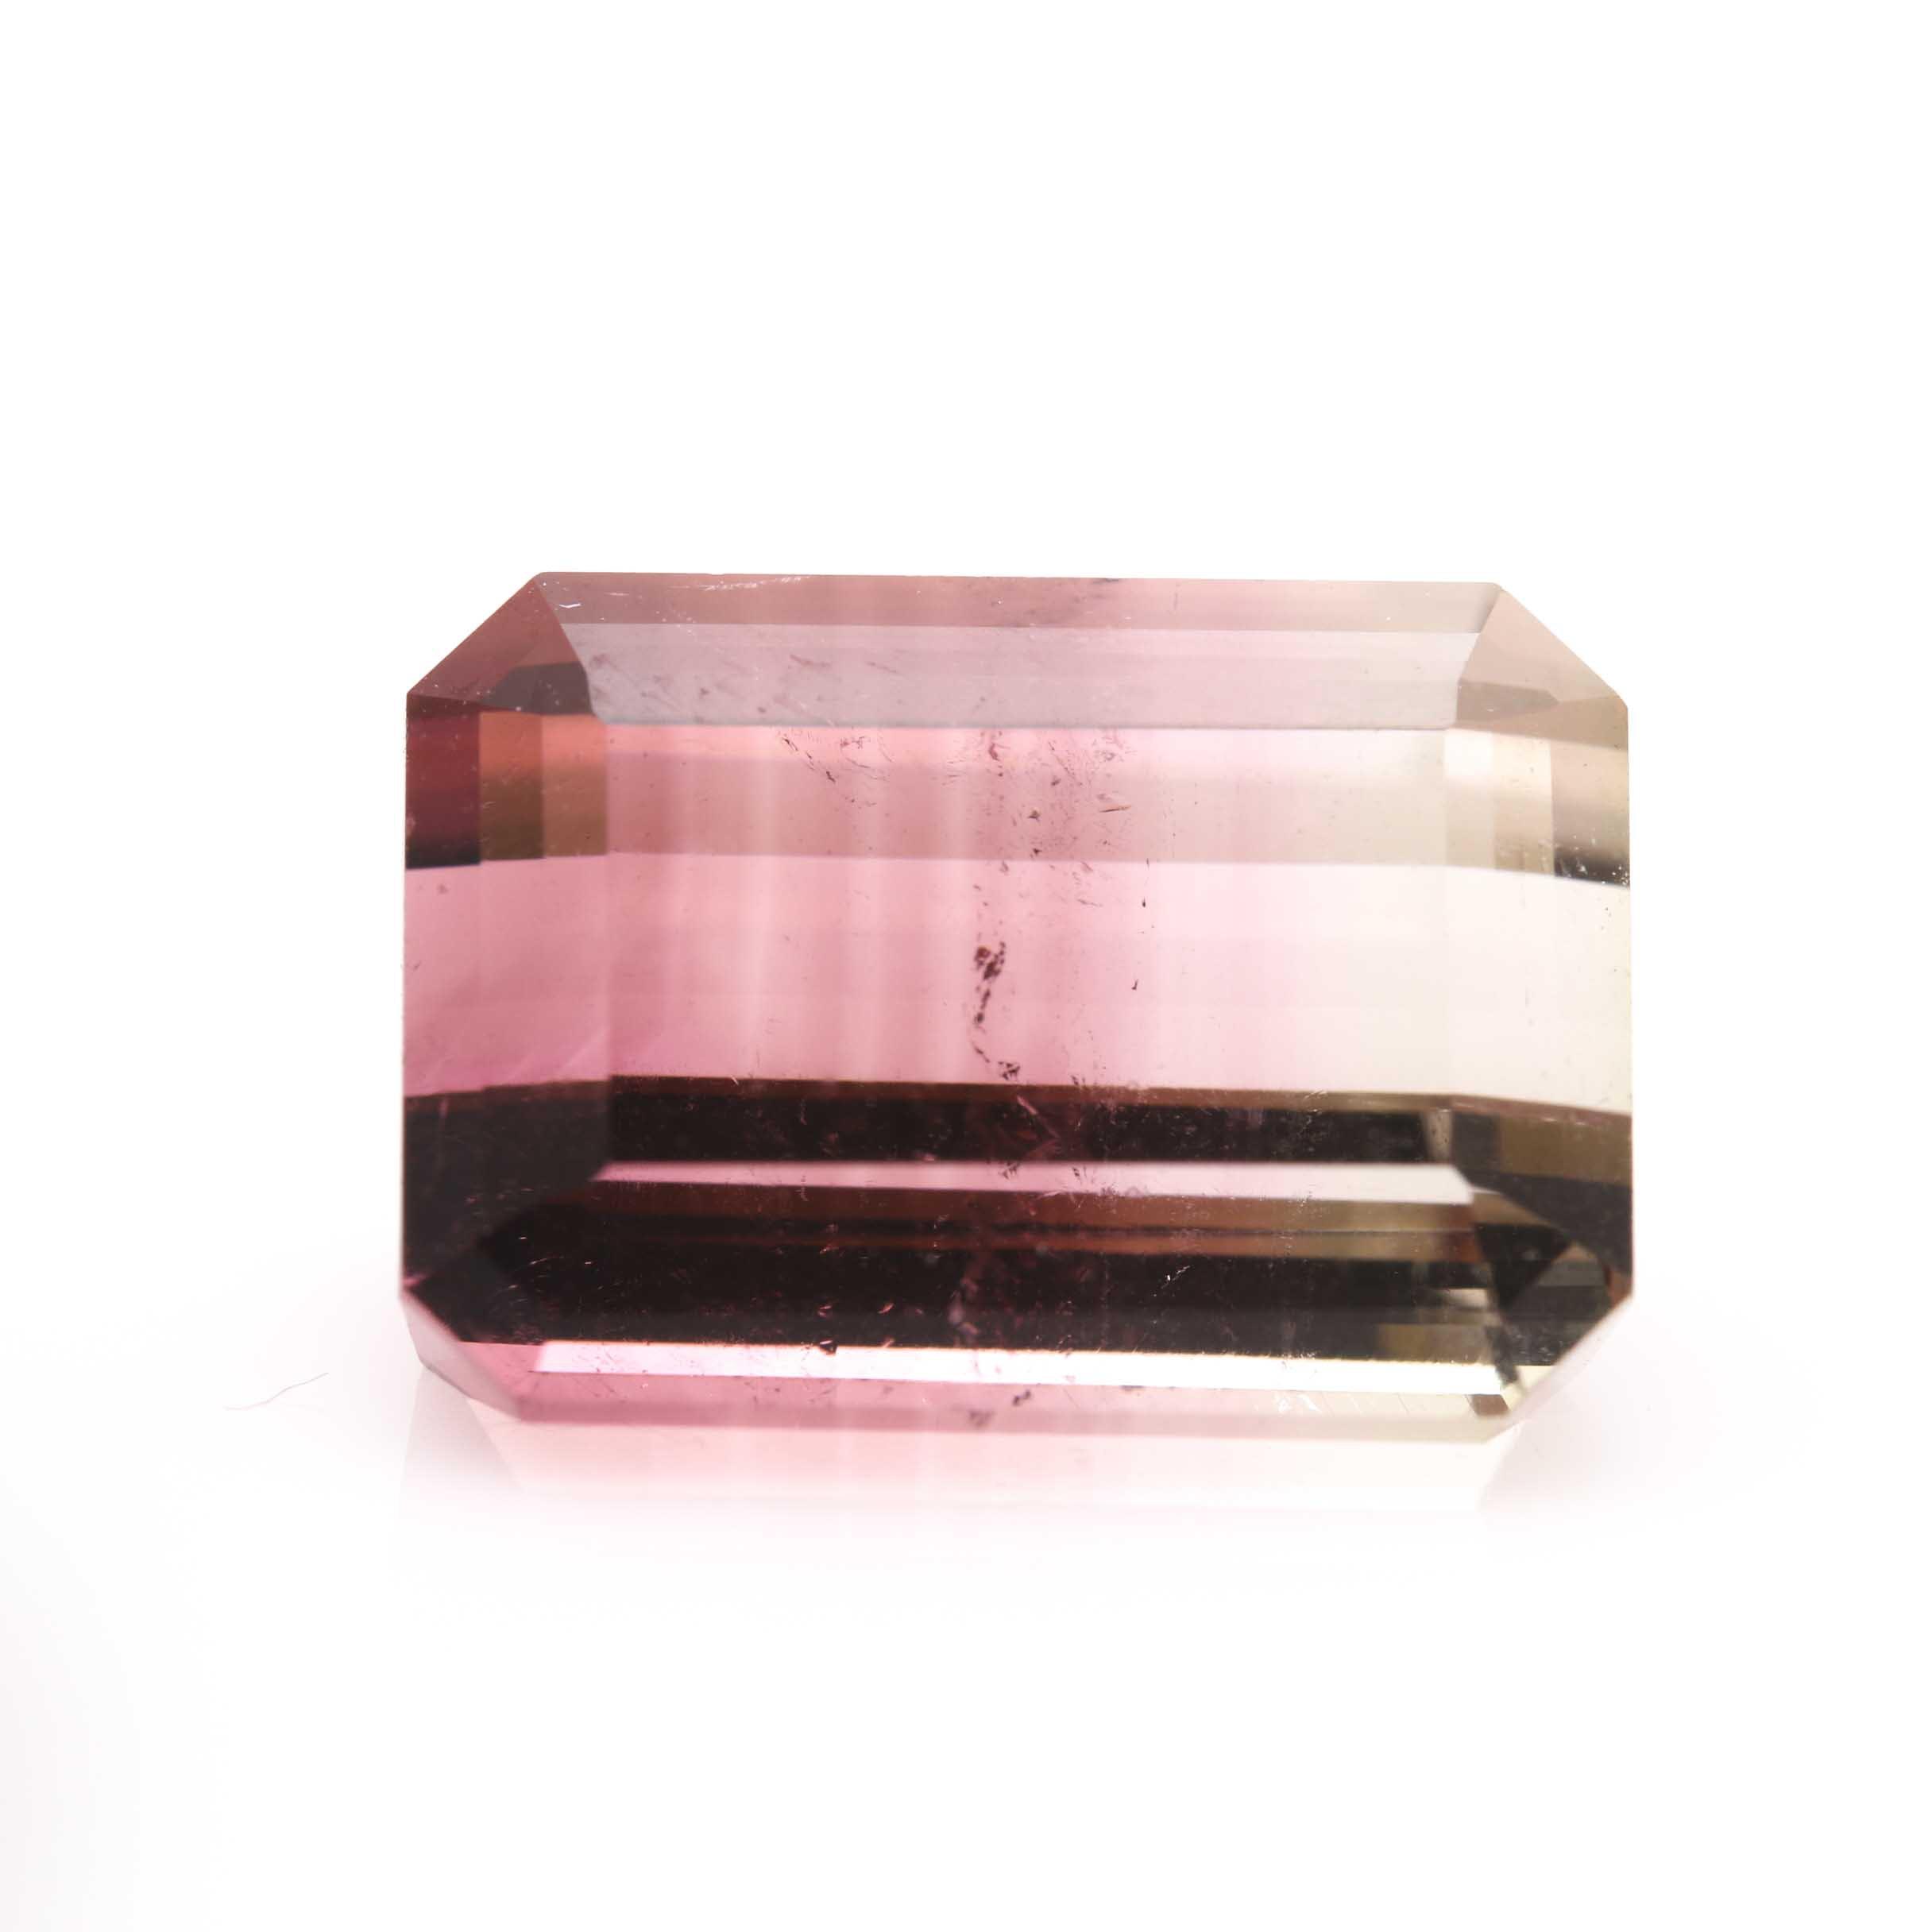 5.23 CTS Bi-Color Tourmaline